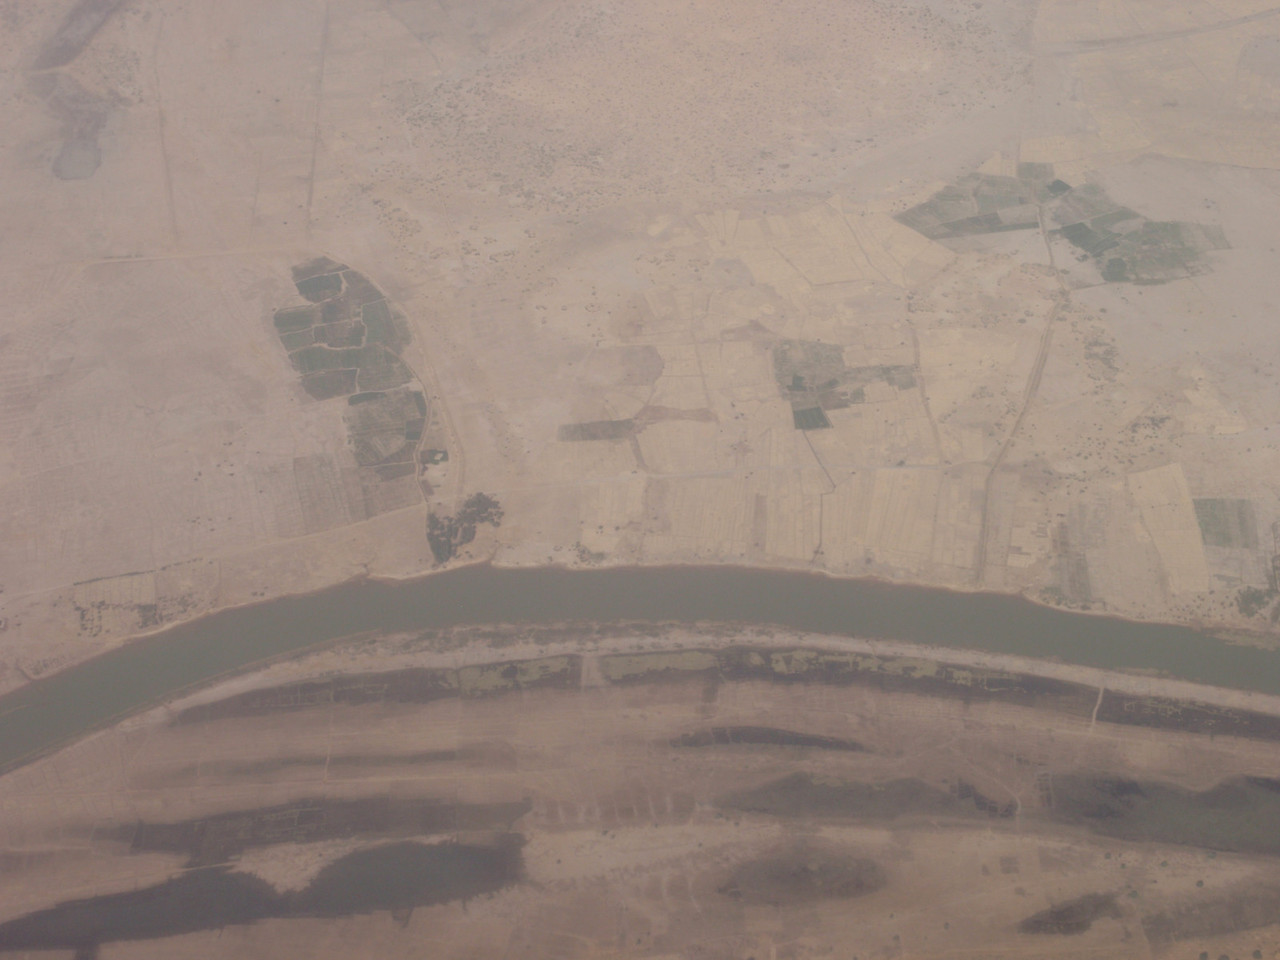 026_From the Dry Sahel Belt to the Unforgiving Sahara